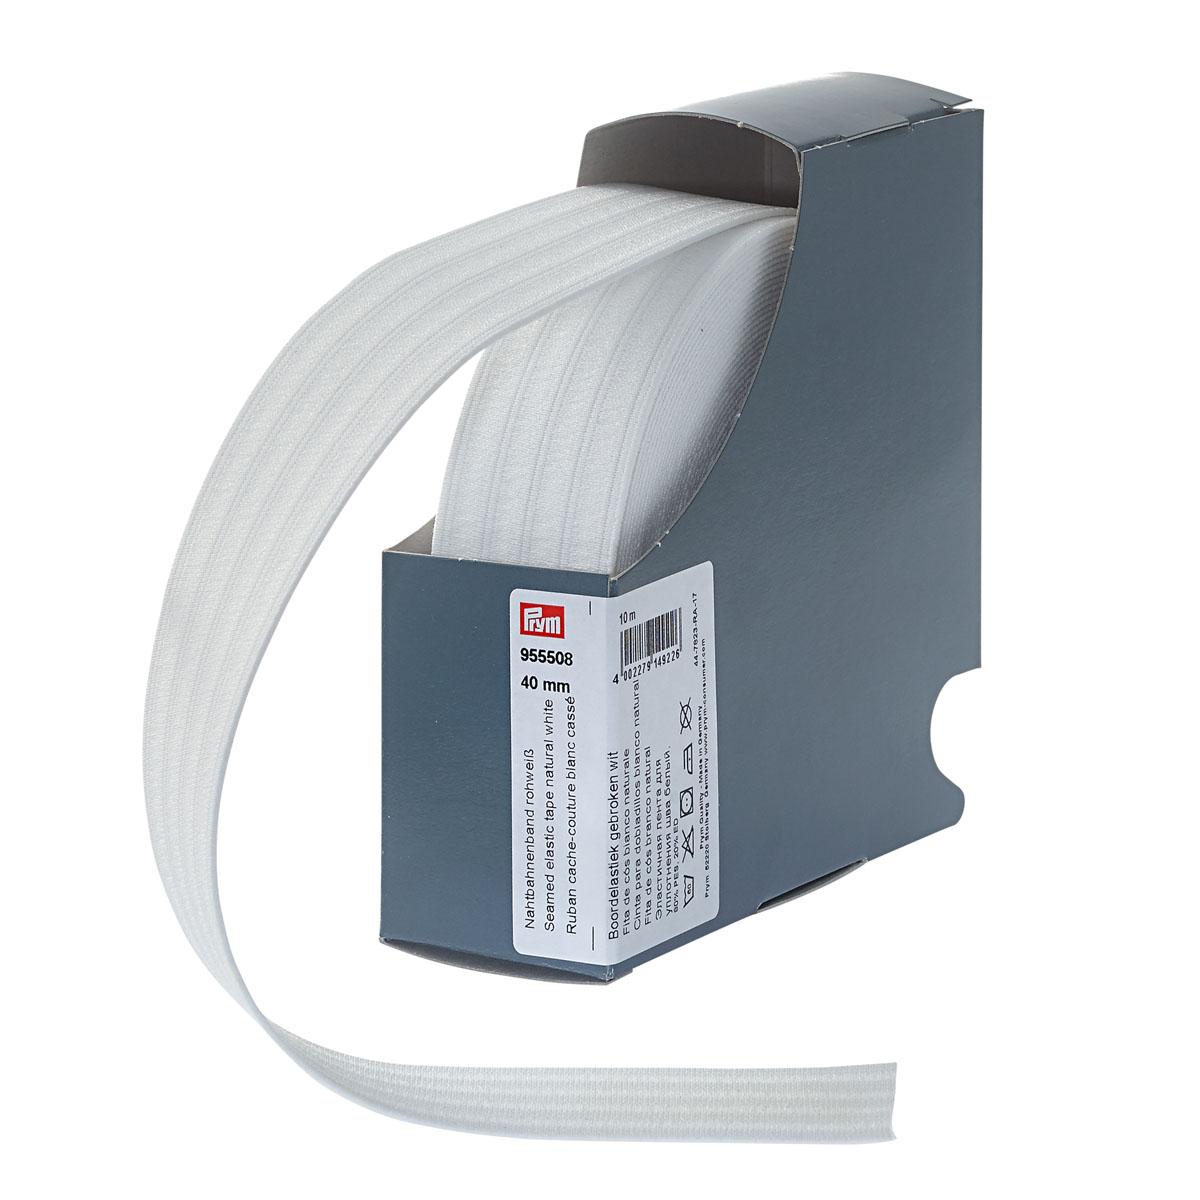 955508 Эластичная лента для уплотнения шва 40 мм 10м белый натуральный цв. Prym